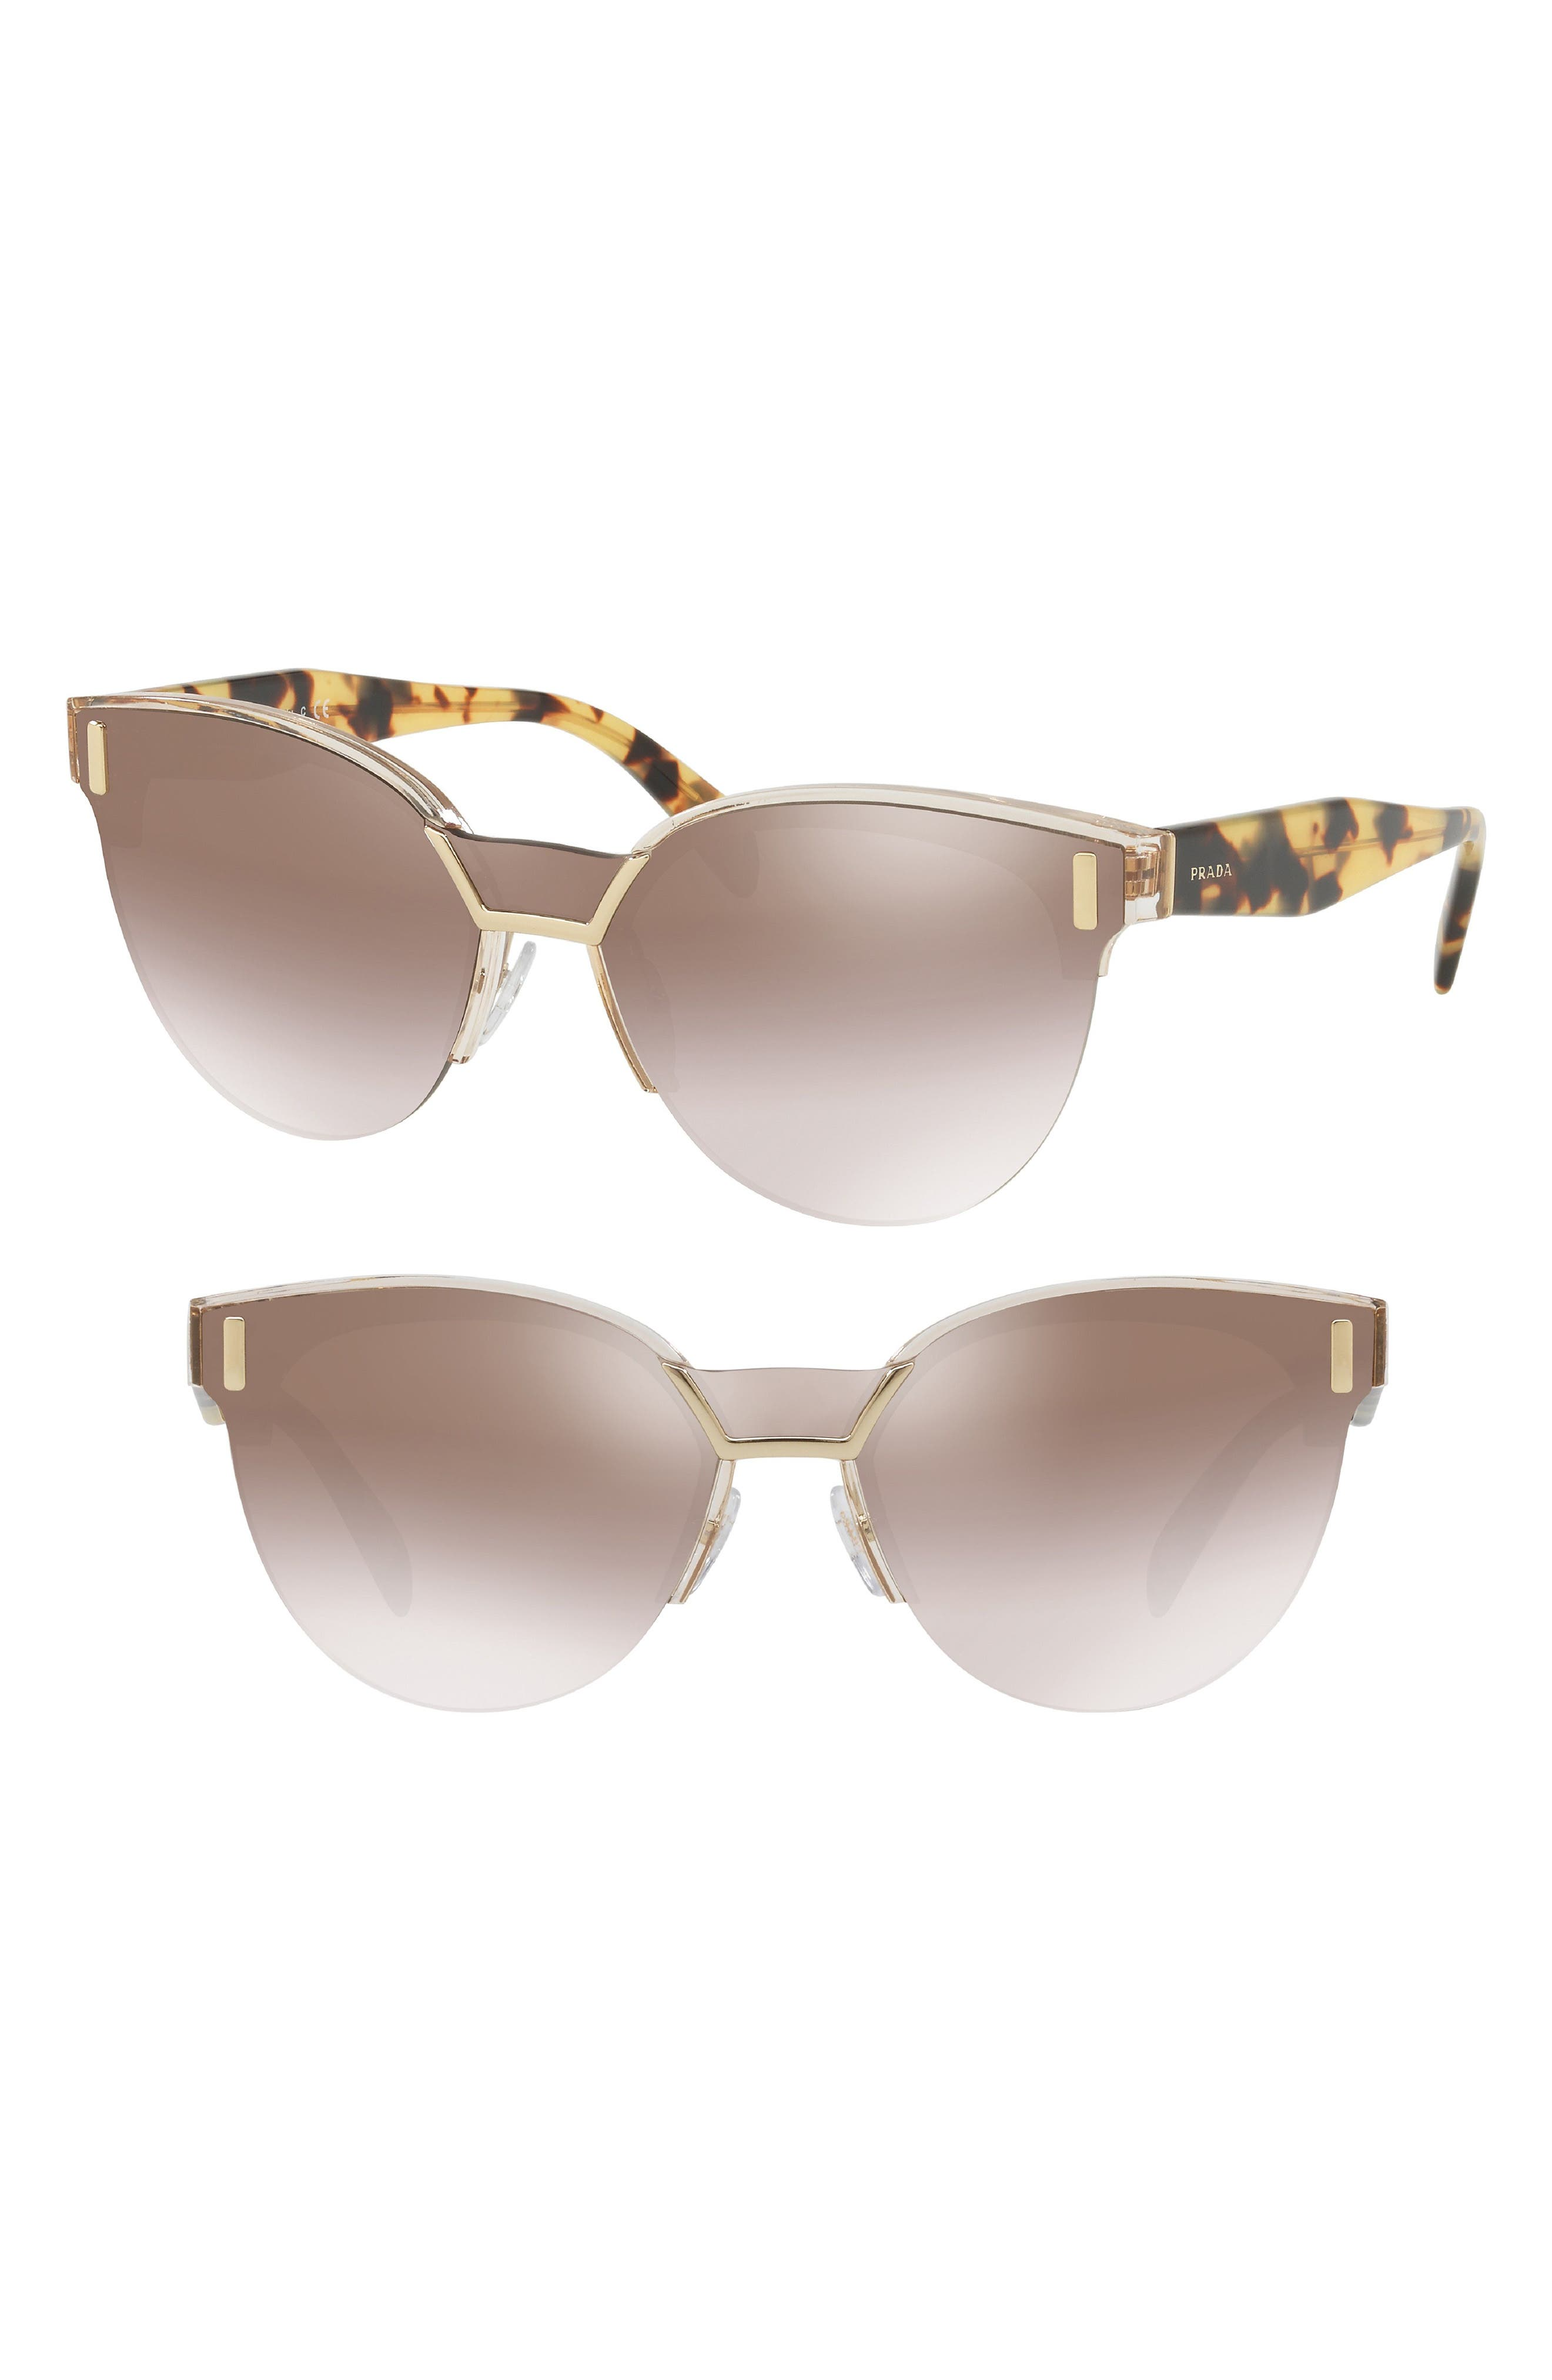 43mm Semi Rimless Sunglasses,                             Alternate thumbnail 2, color,                             TRANSPARENT BROWN